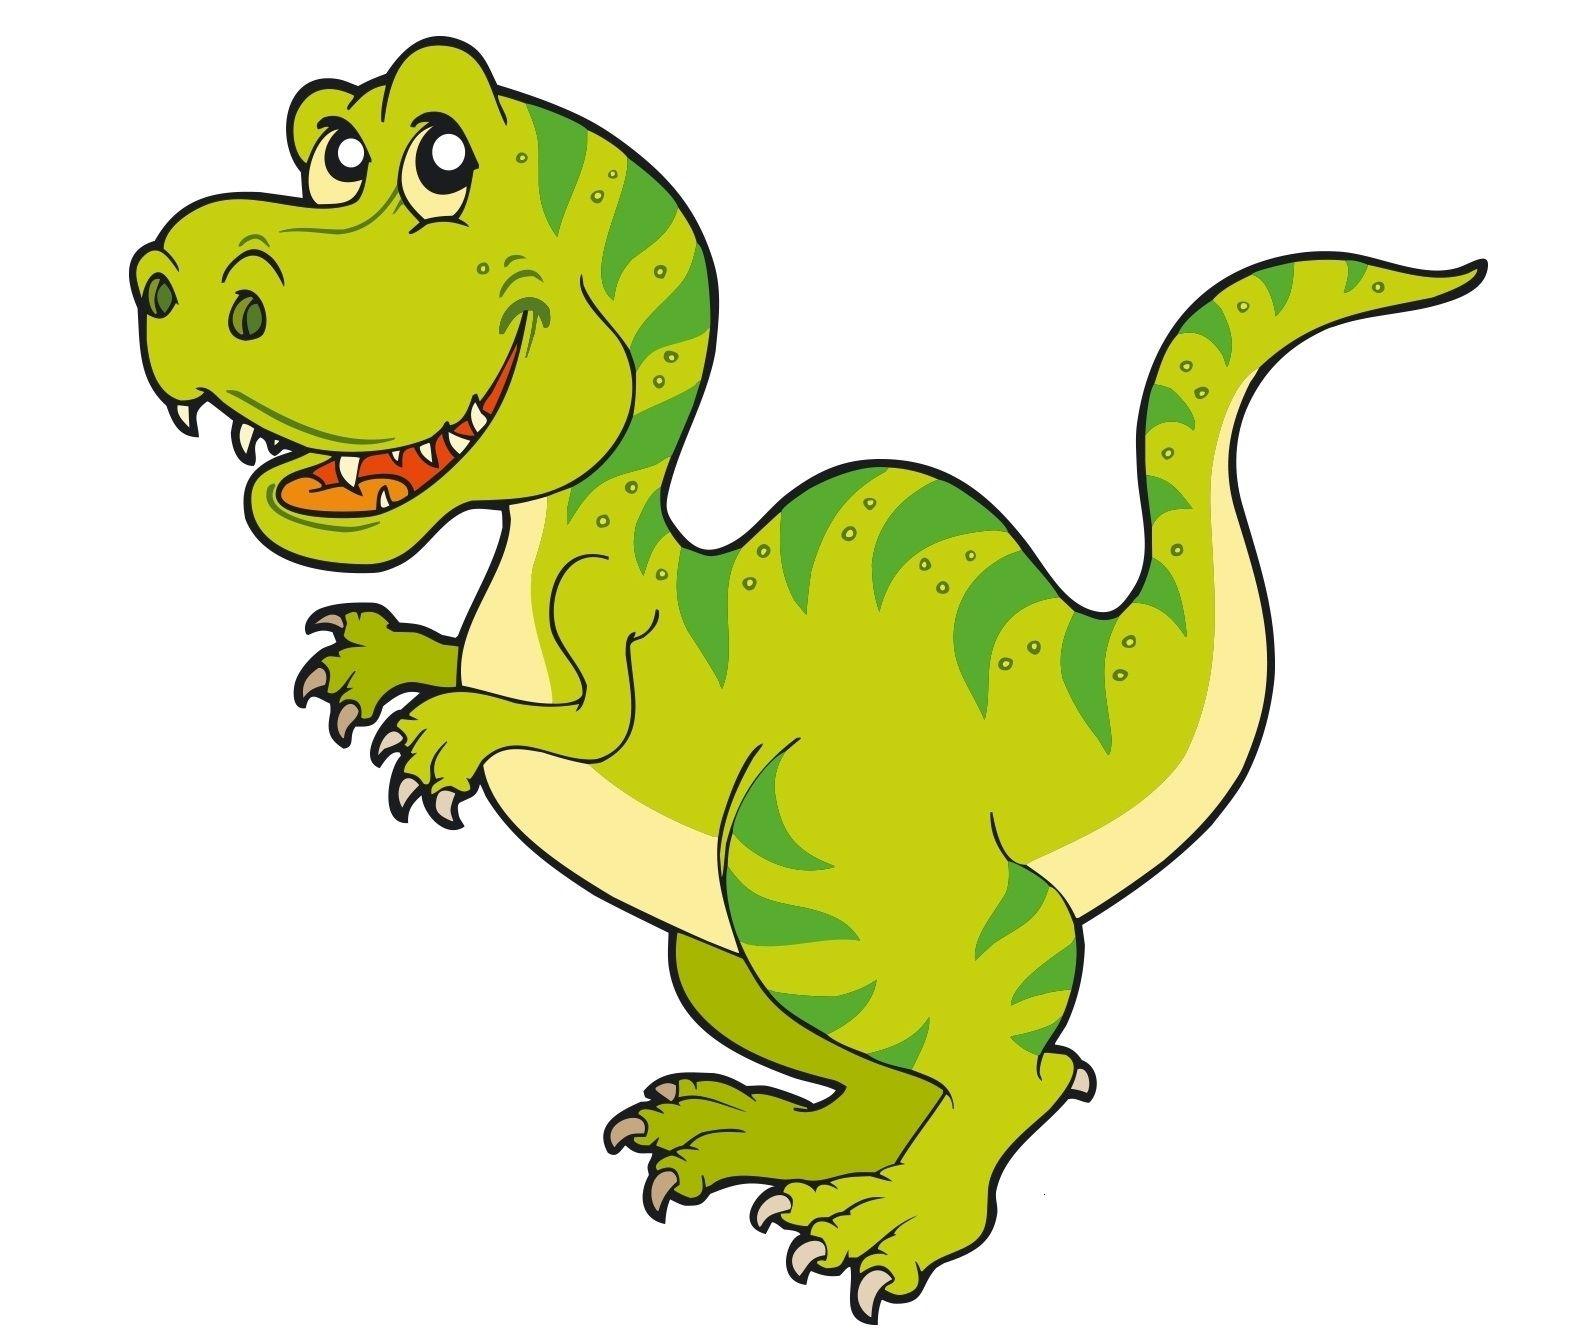 Gross Image 950285 1 Jpg 1591 1339 Clipart Schultute Dinosaurier Tyrannosaurus